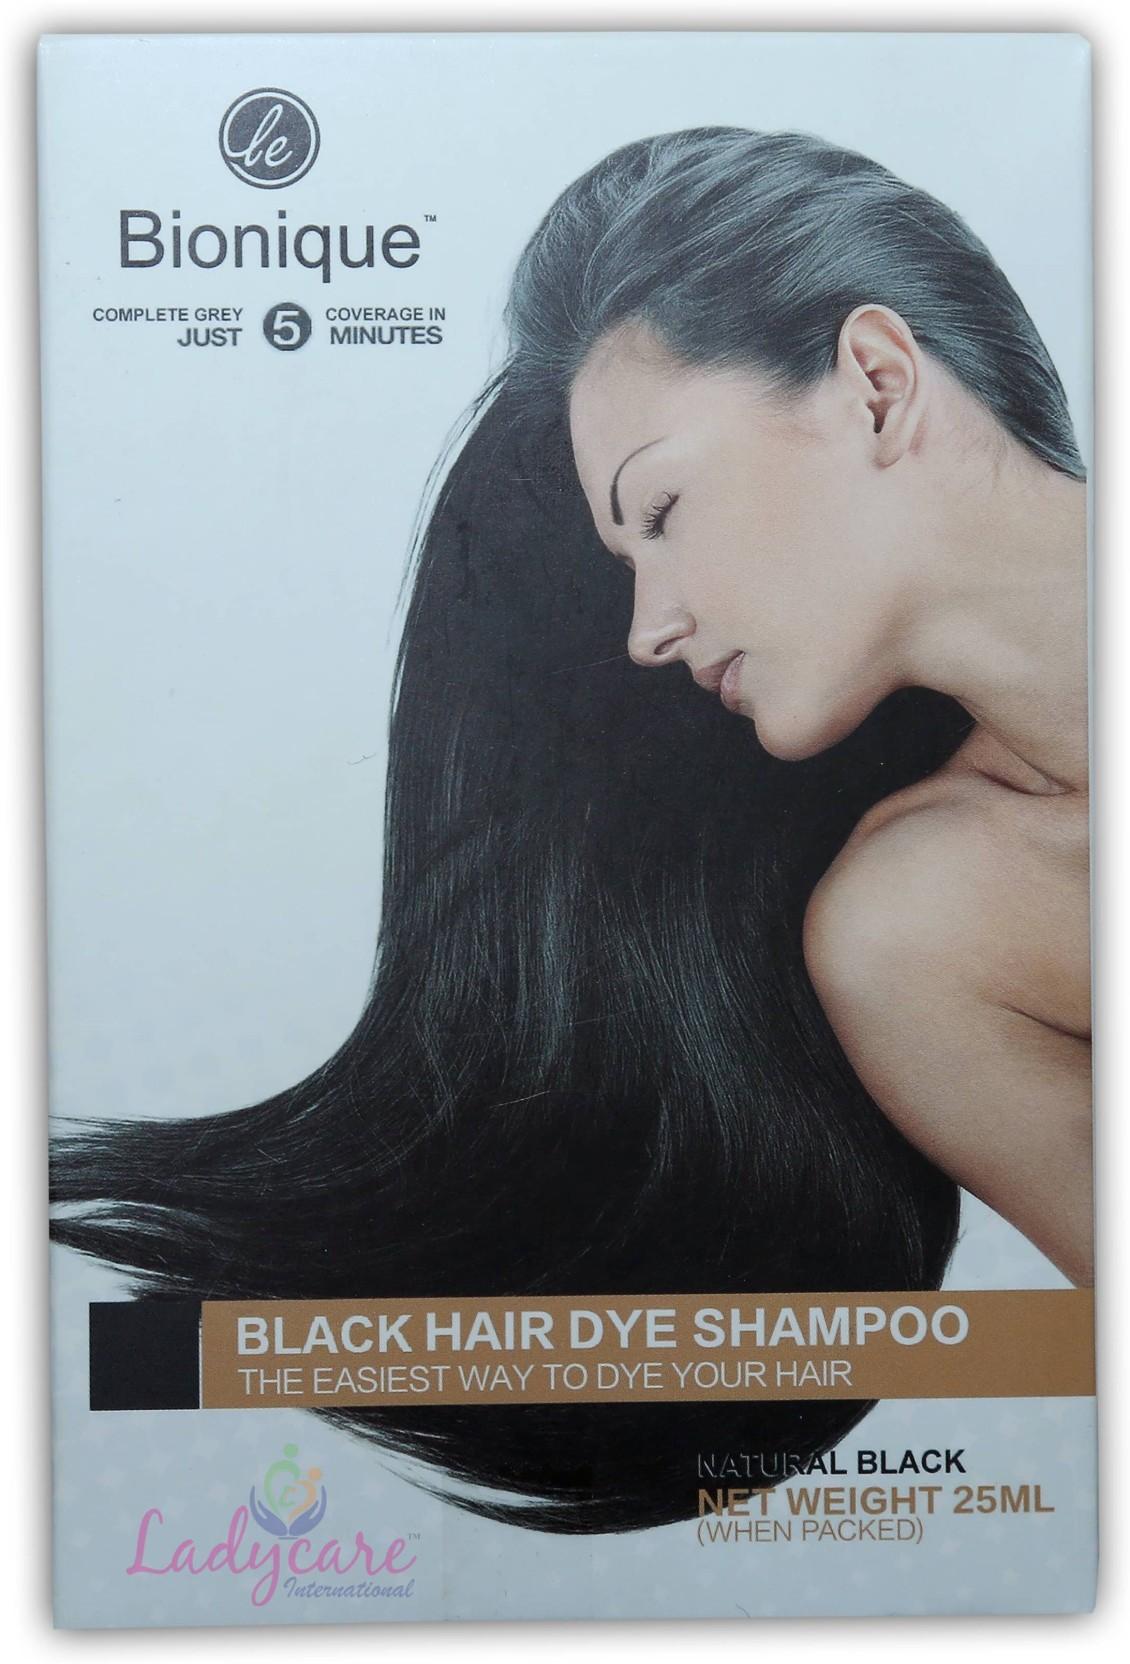 Le Bionique Hair Color Price In India Buy Le Bionique Hair Color